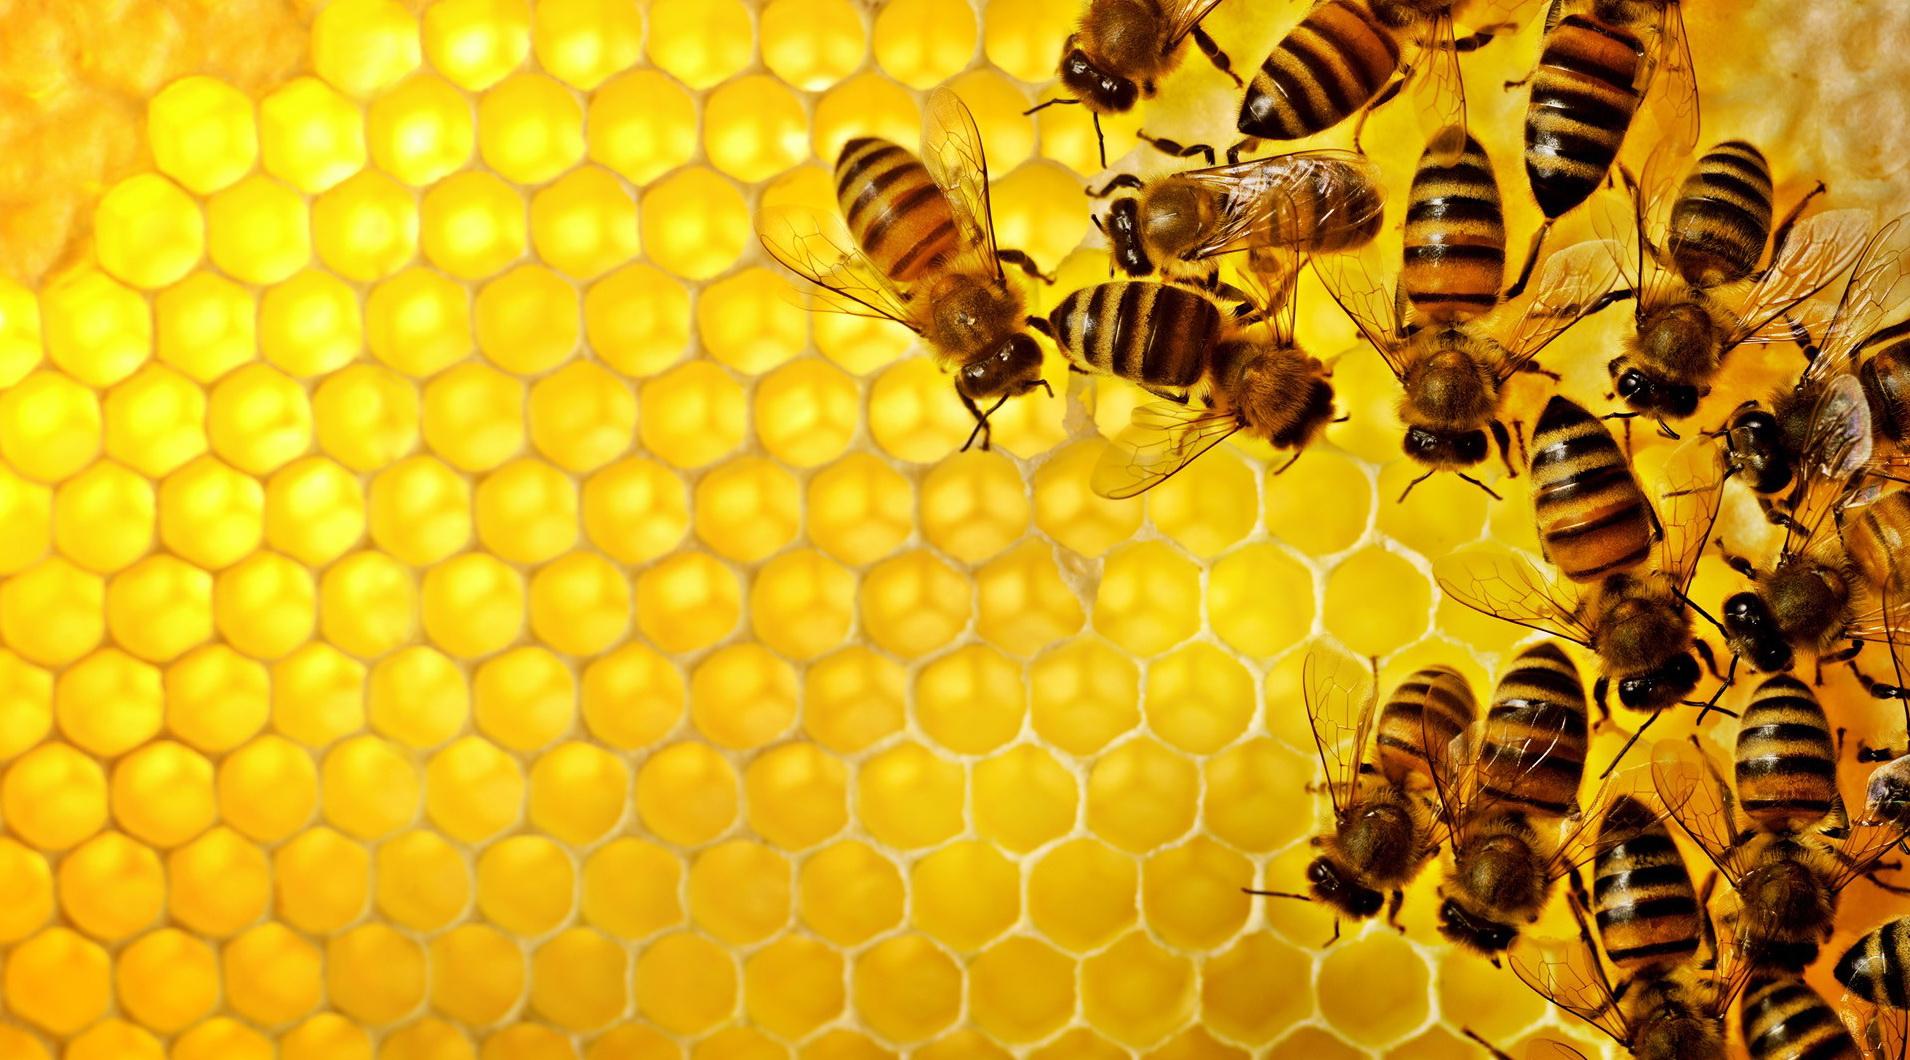 File Name Honey Bee Desktop Wallpapers 1910x1060